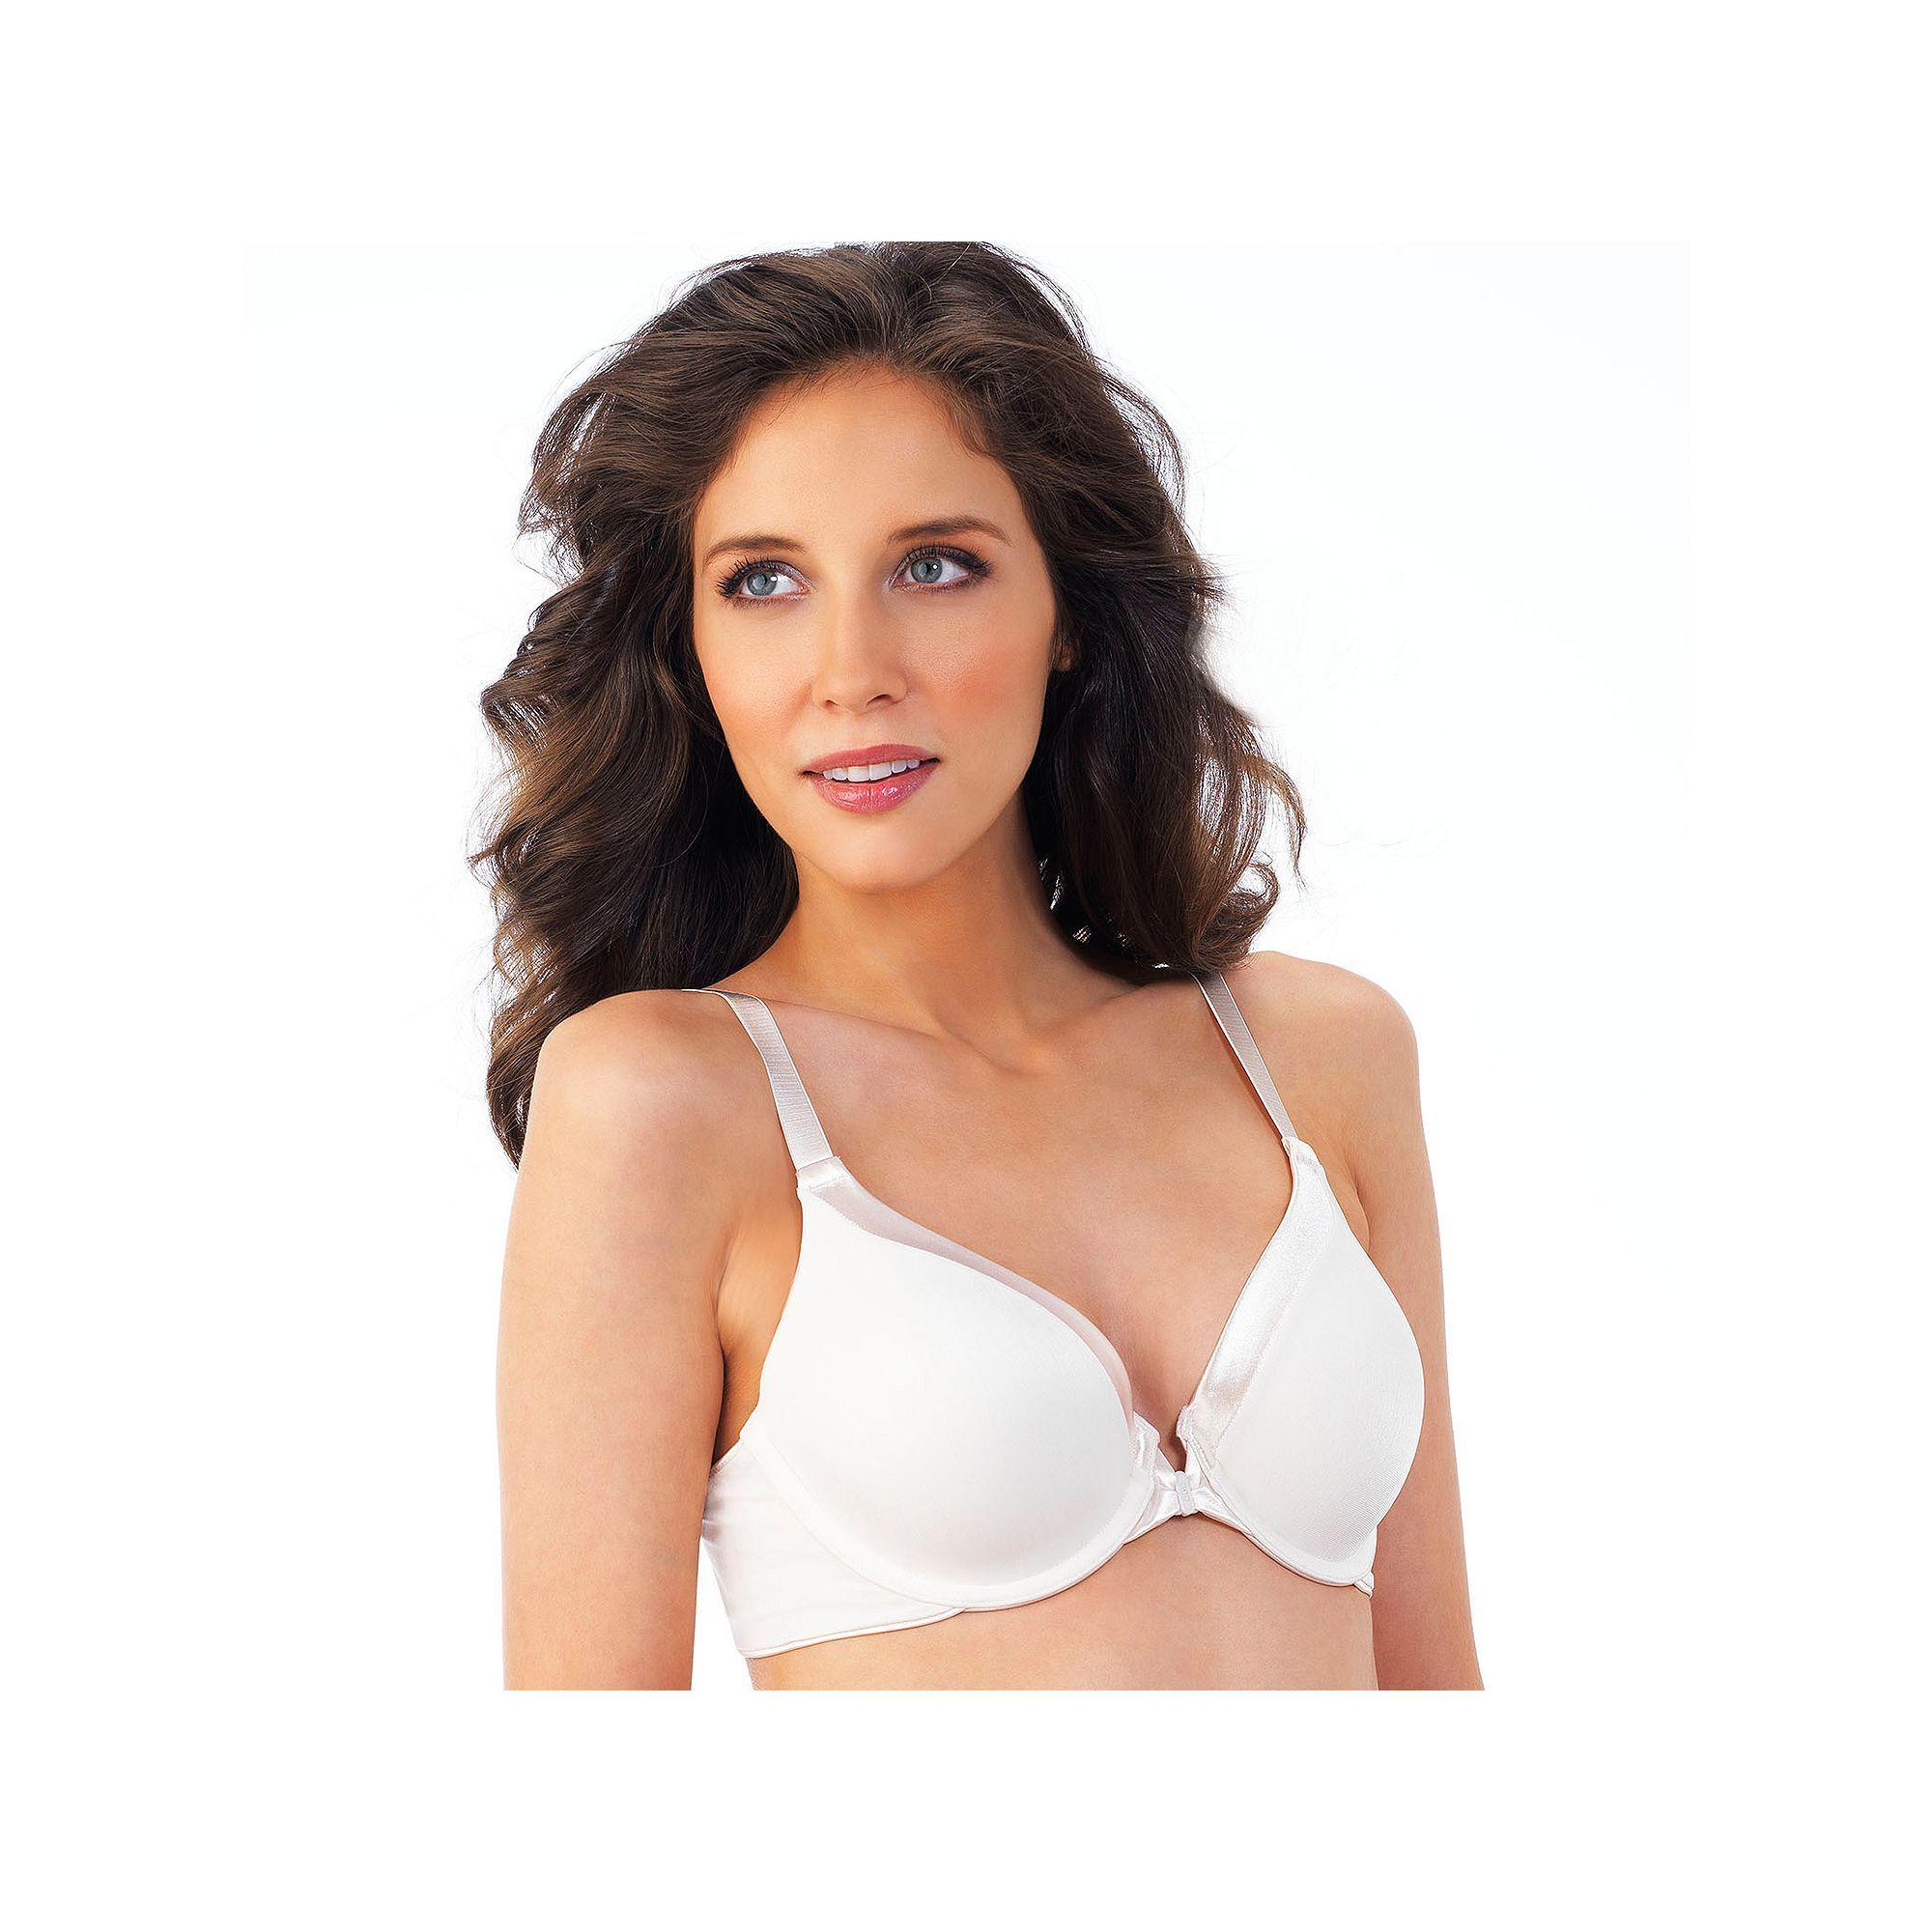 haute bra fair c lingerie strapless front closure bras vanity berry dillards ups zi push lace